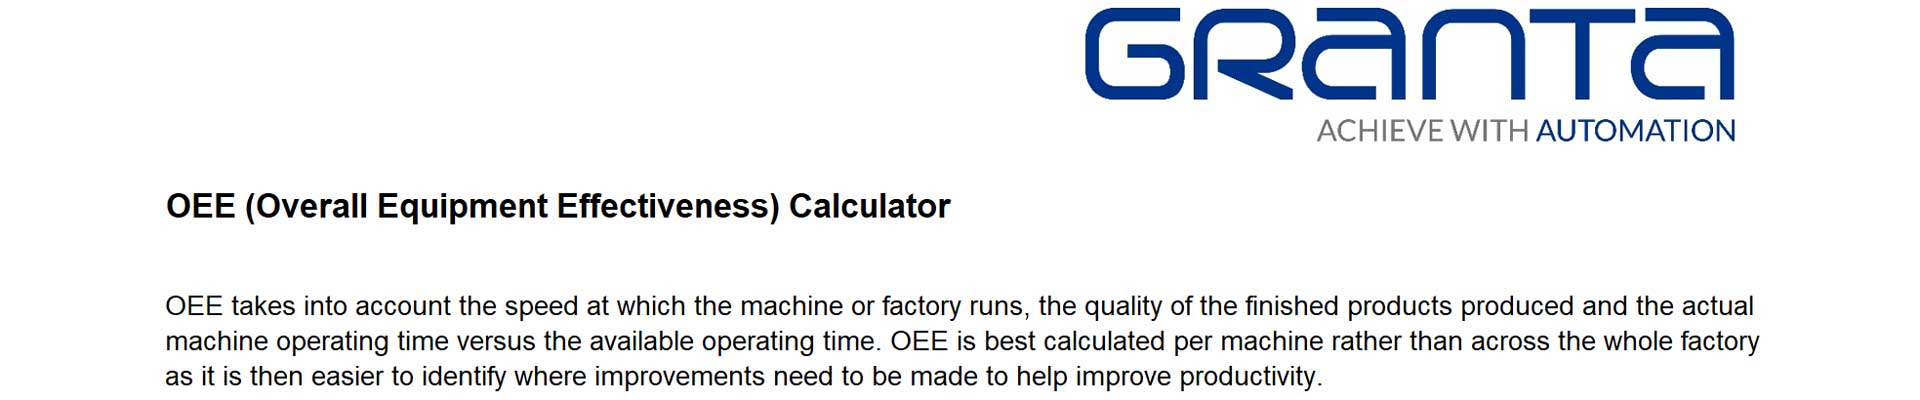 OEE Calculator